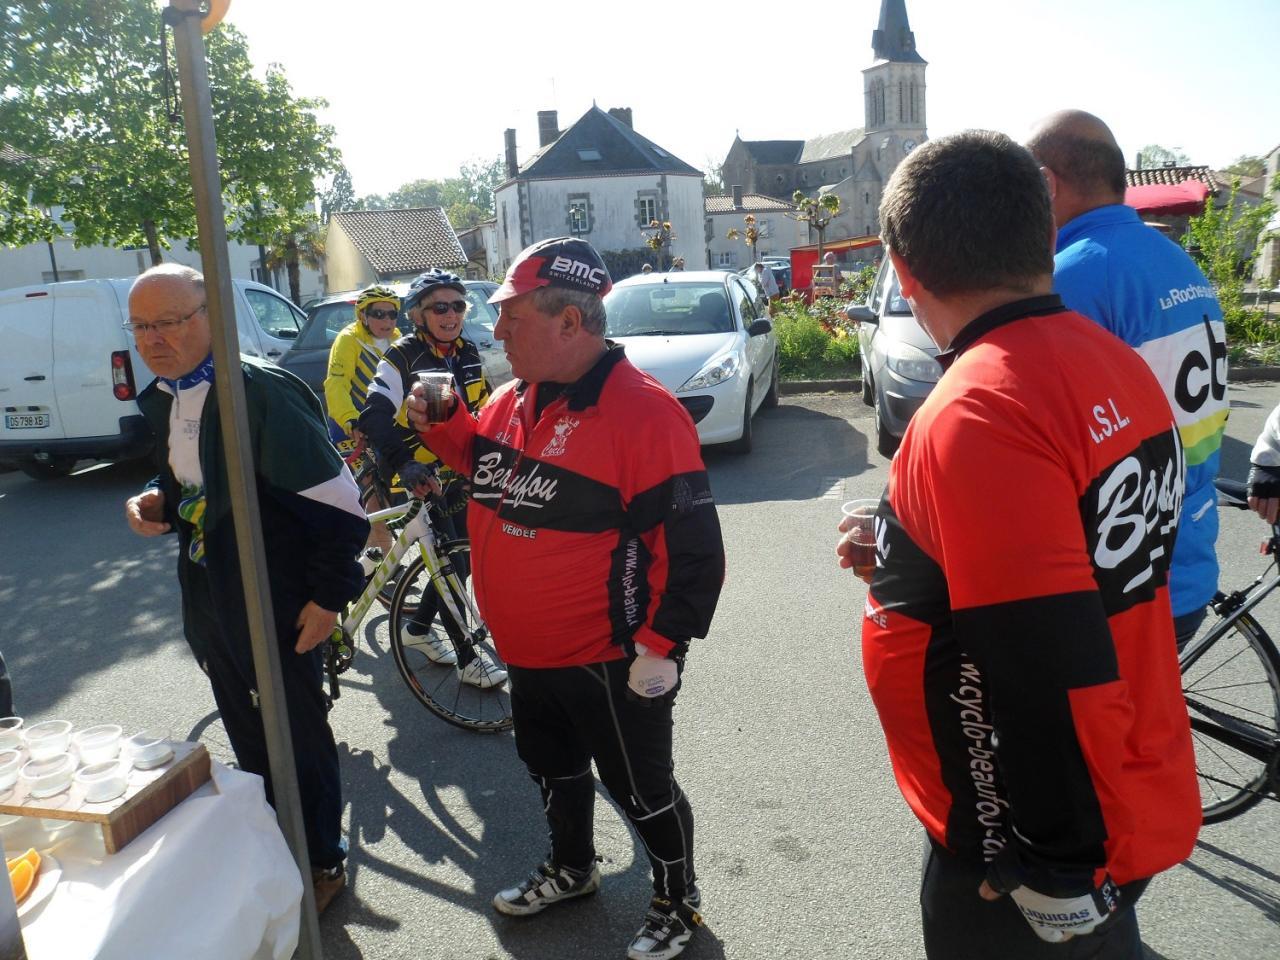 20170423_Ravitaillement Cyclo de Saligny_53